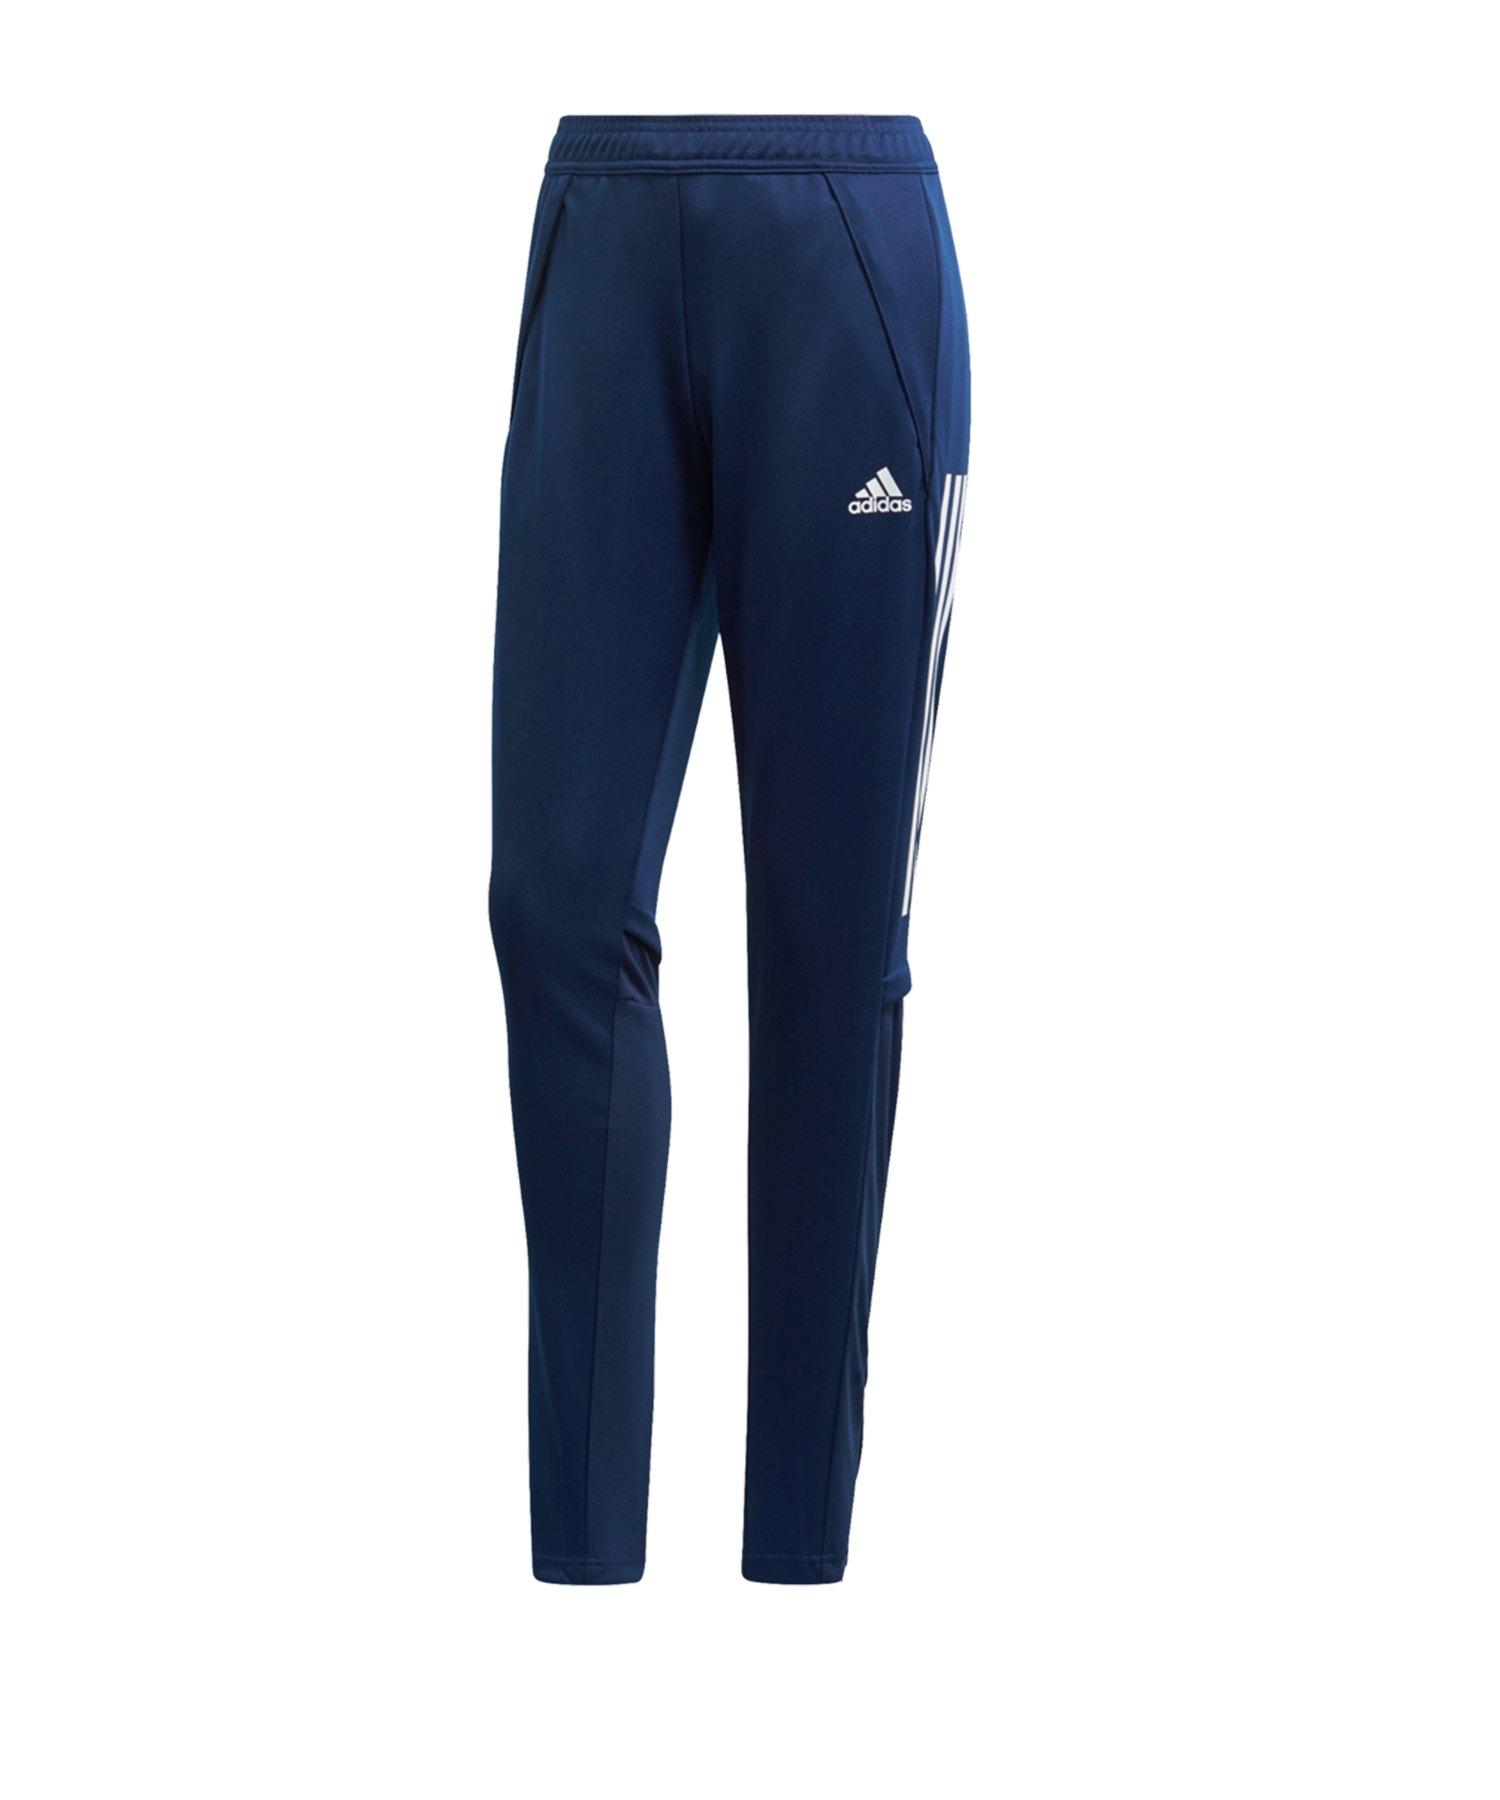 adidas Condivo 20 Trainingshose Damen Blau Weiss - blau